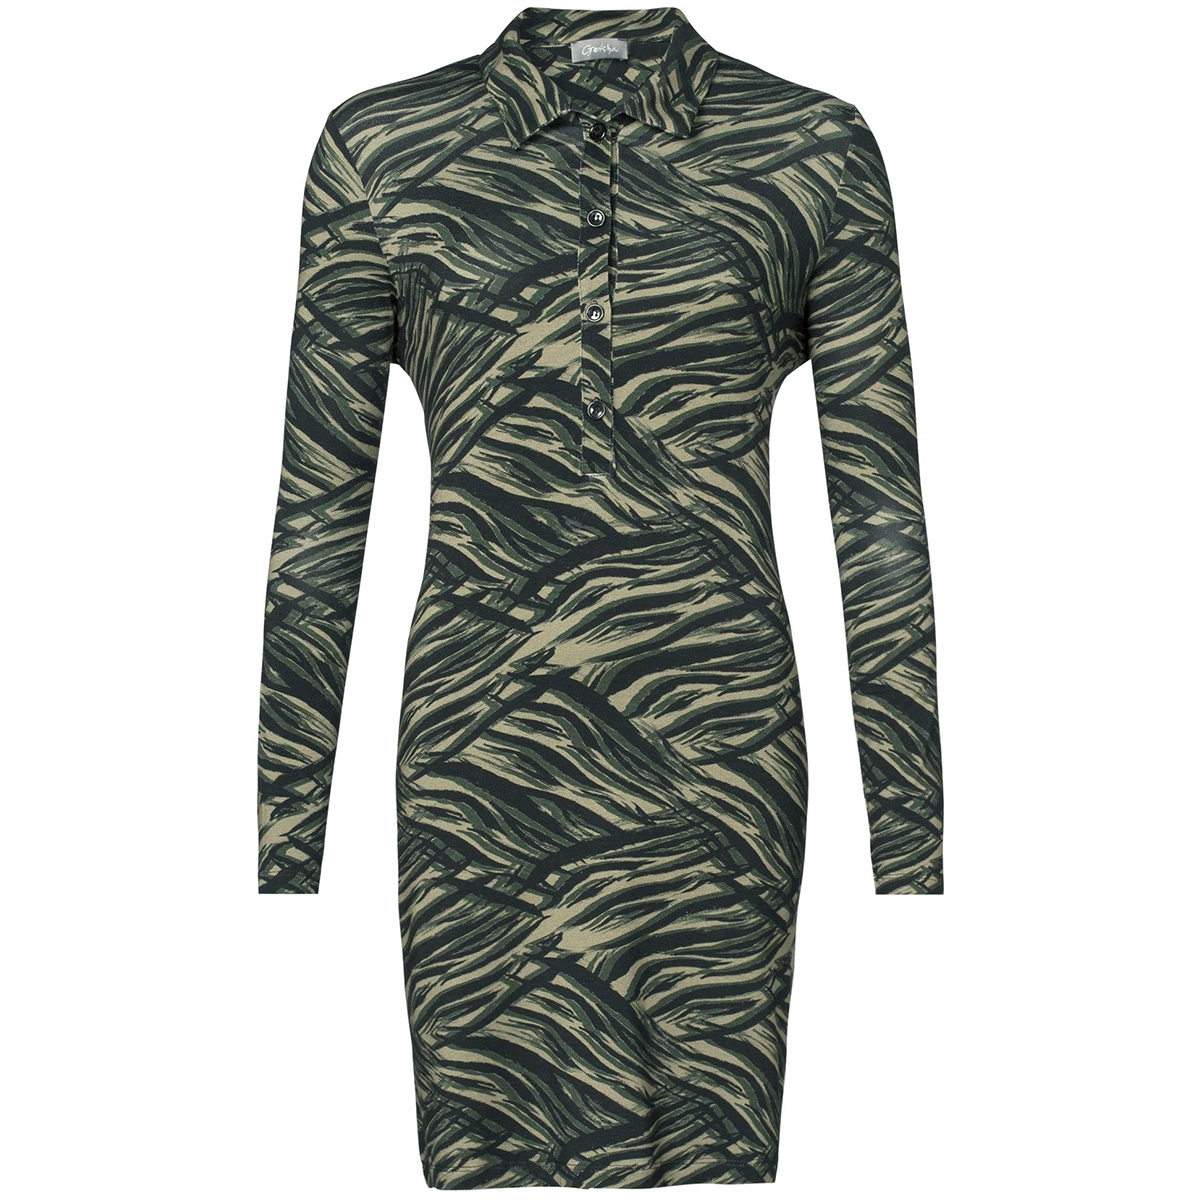 dress aop zebra 97871 60 geisha jurk 000550 army comb